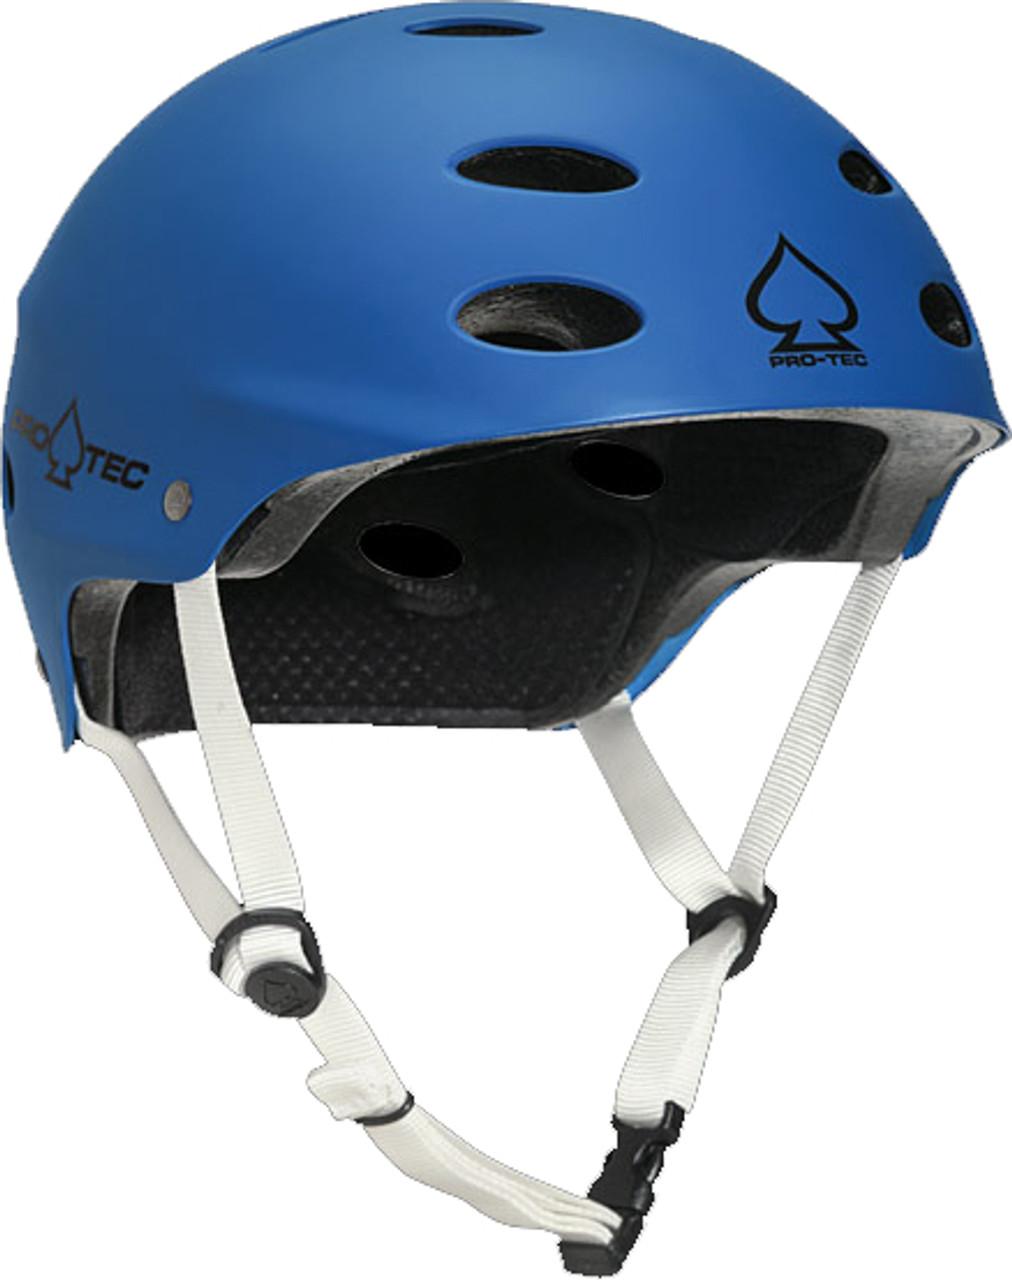 Pro Tec Ace Sxp Matte Blue Skateboard Helmet